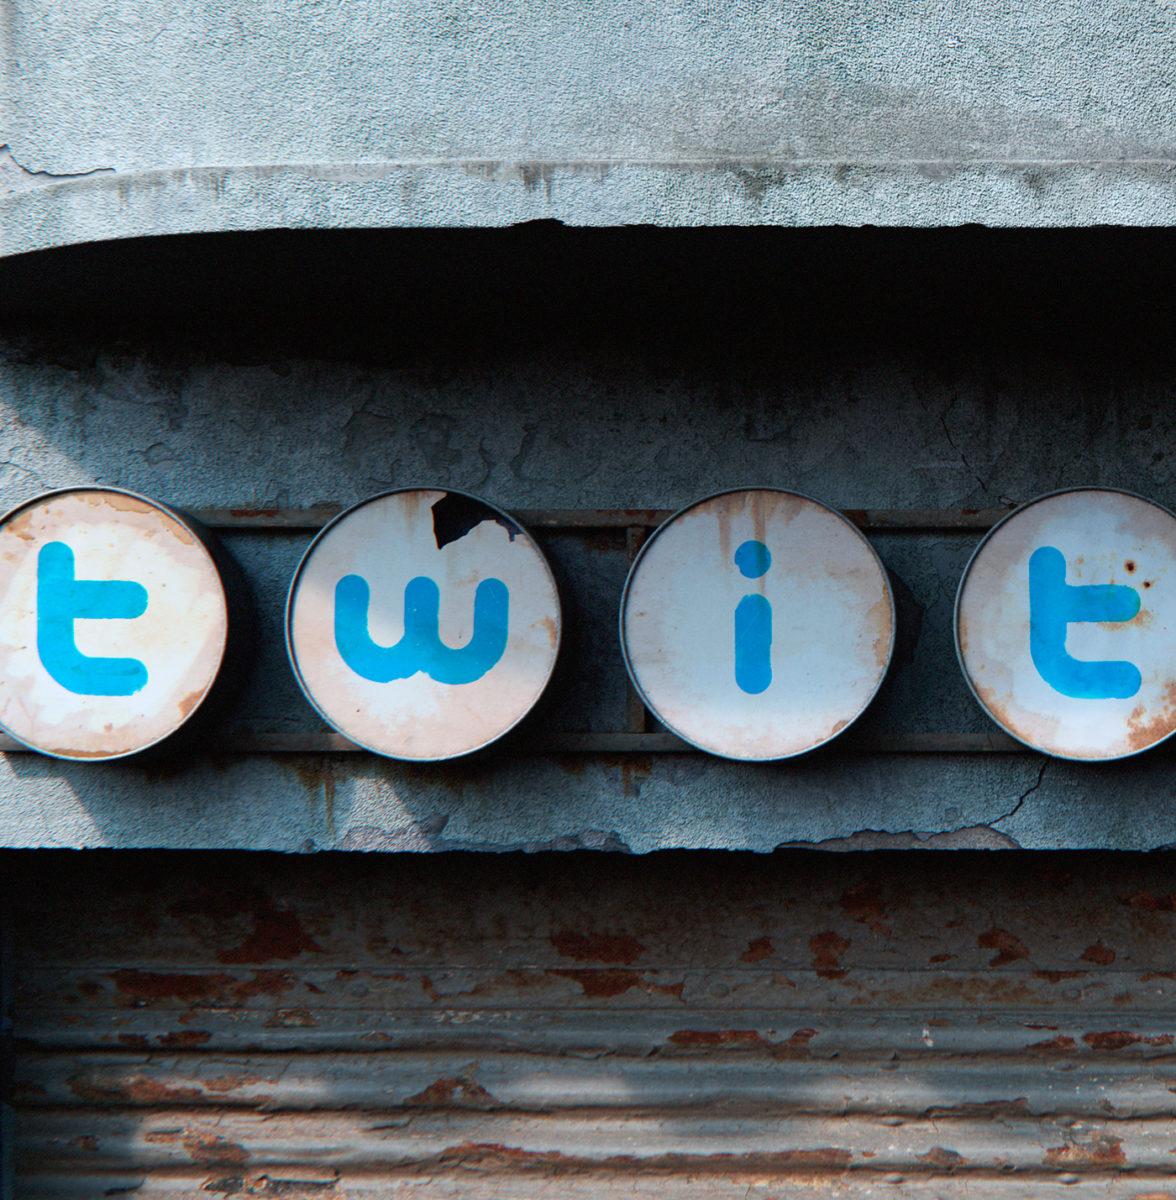 AndreiLacatusu social decay lettres logo enseigne typographie urbain urbex panneau tweet - Social decay : les logos de Twitter, Facebook et Tinder transformés en enseignes vintage